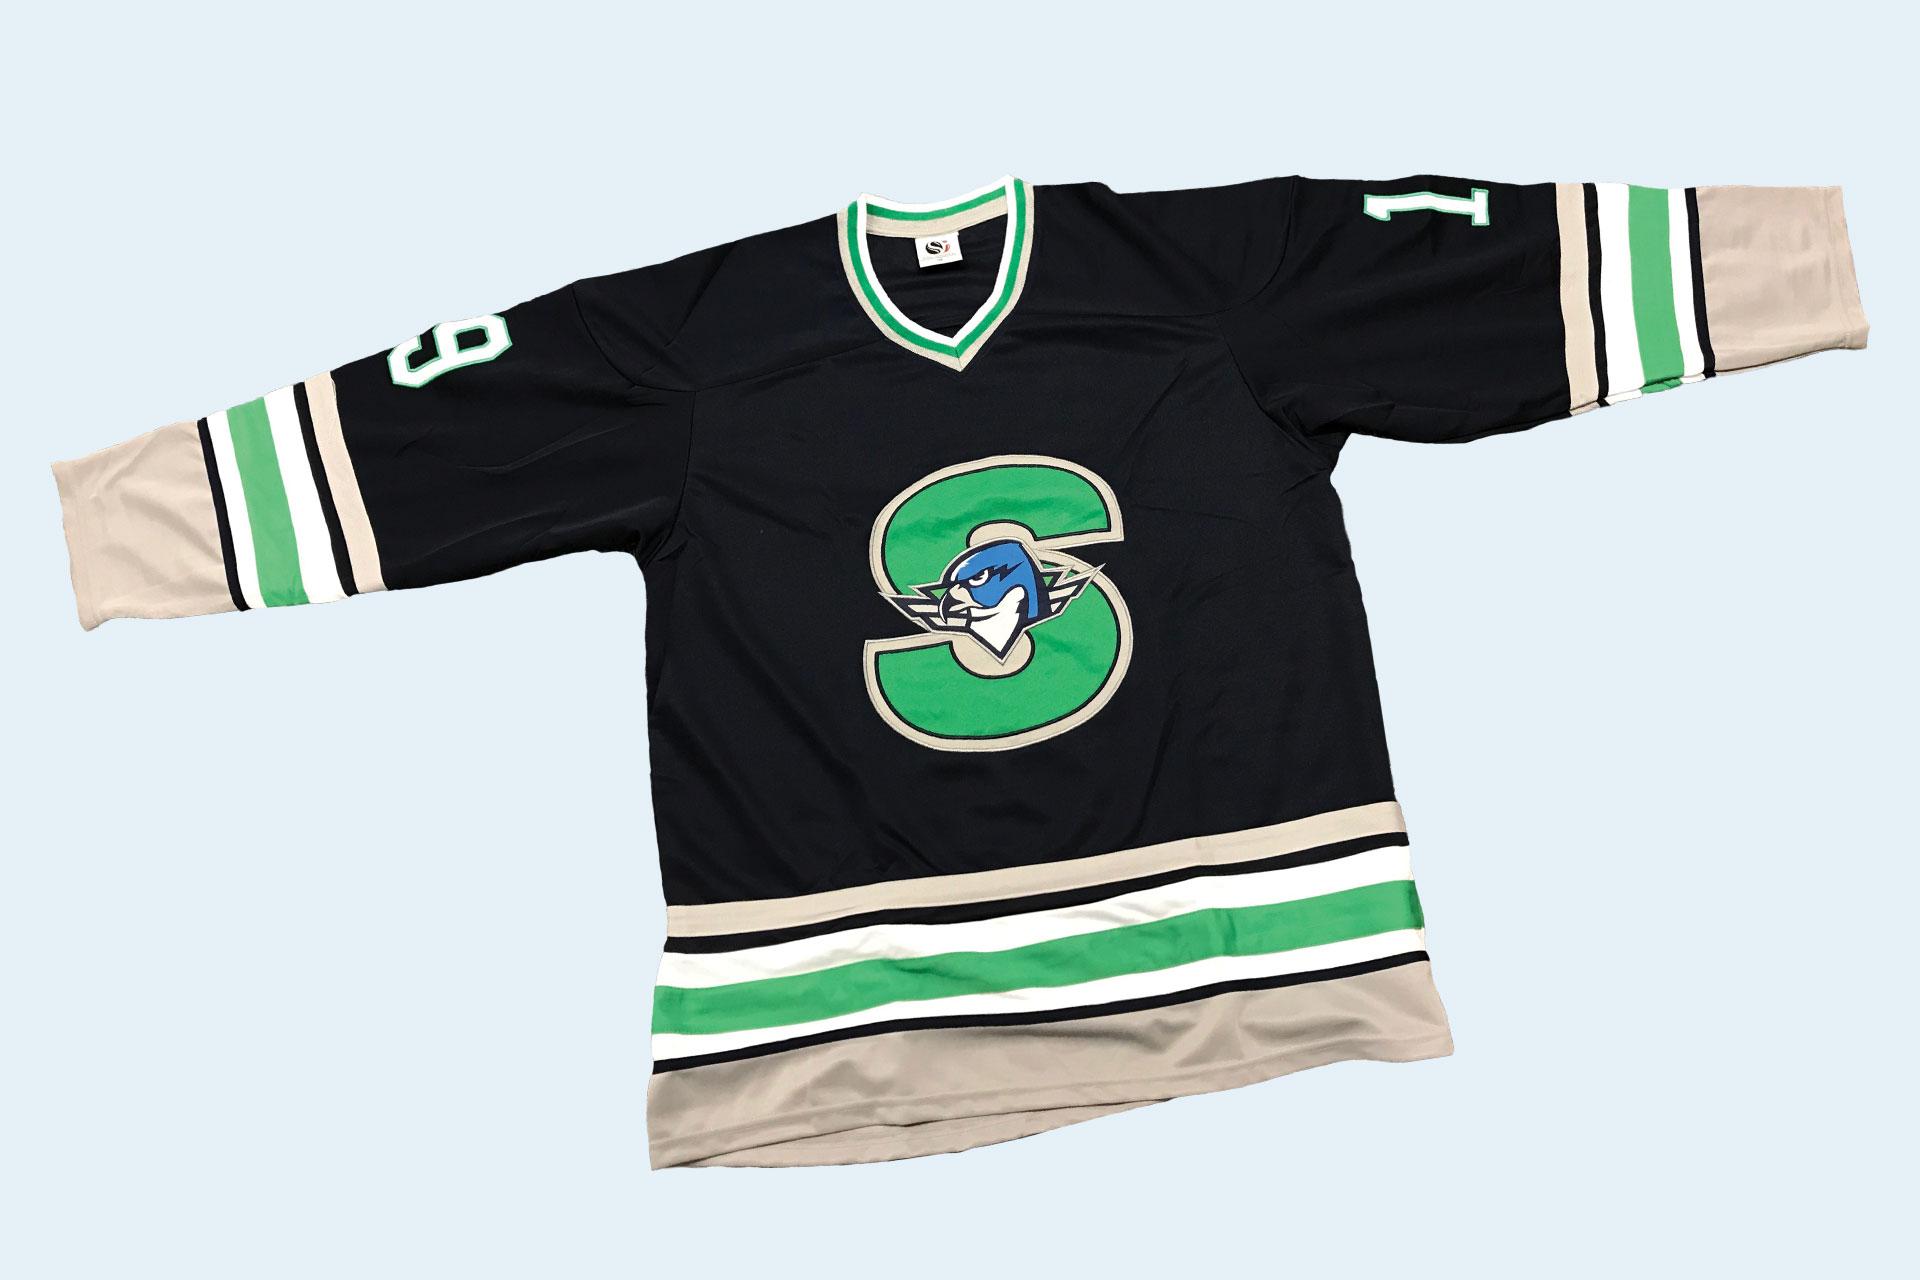 Springfield Thunderbirds jersey